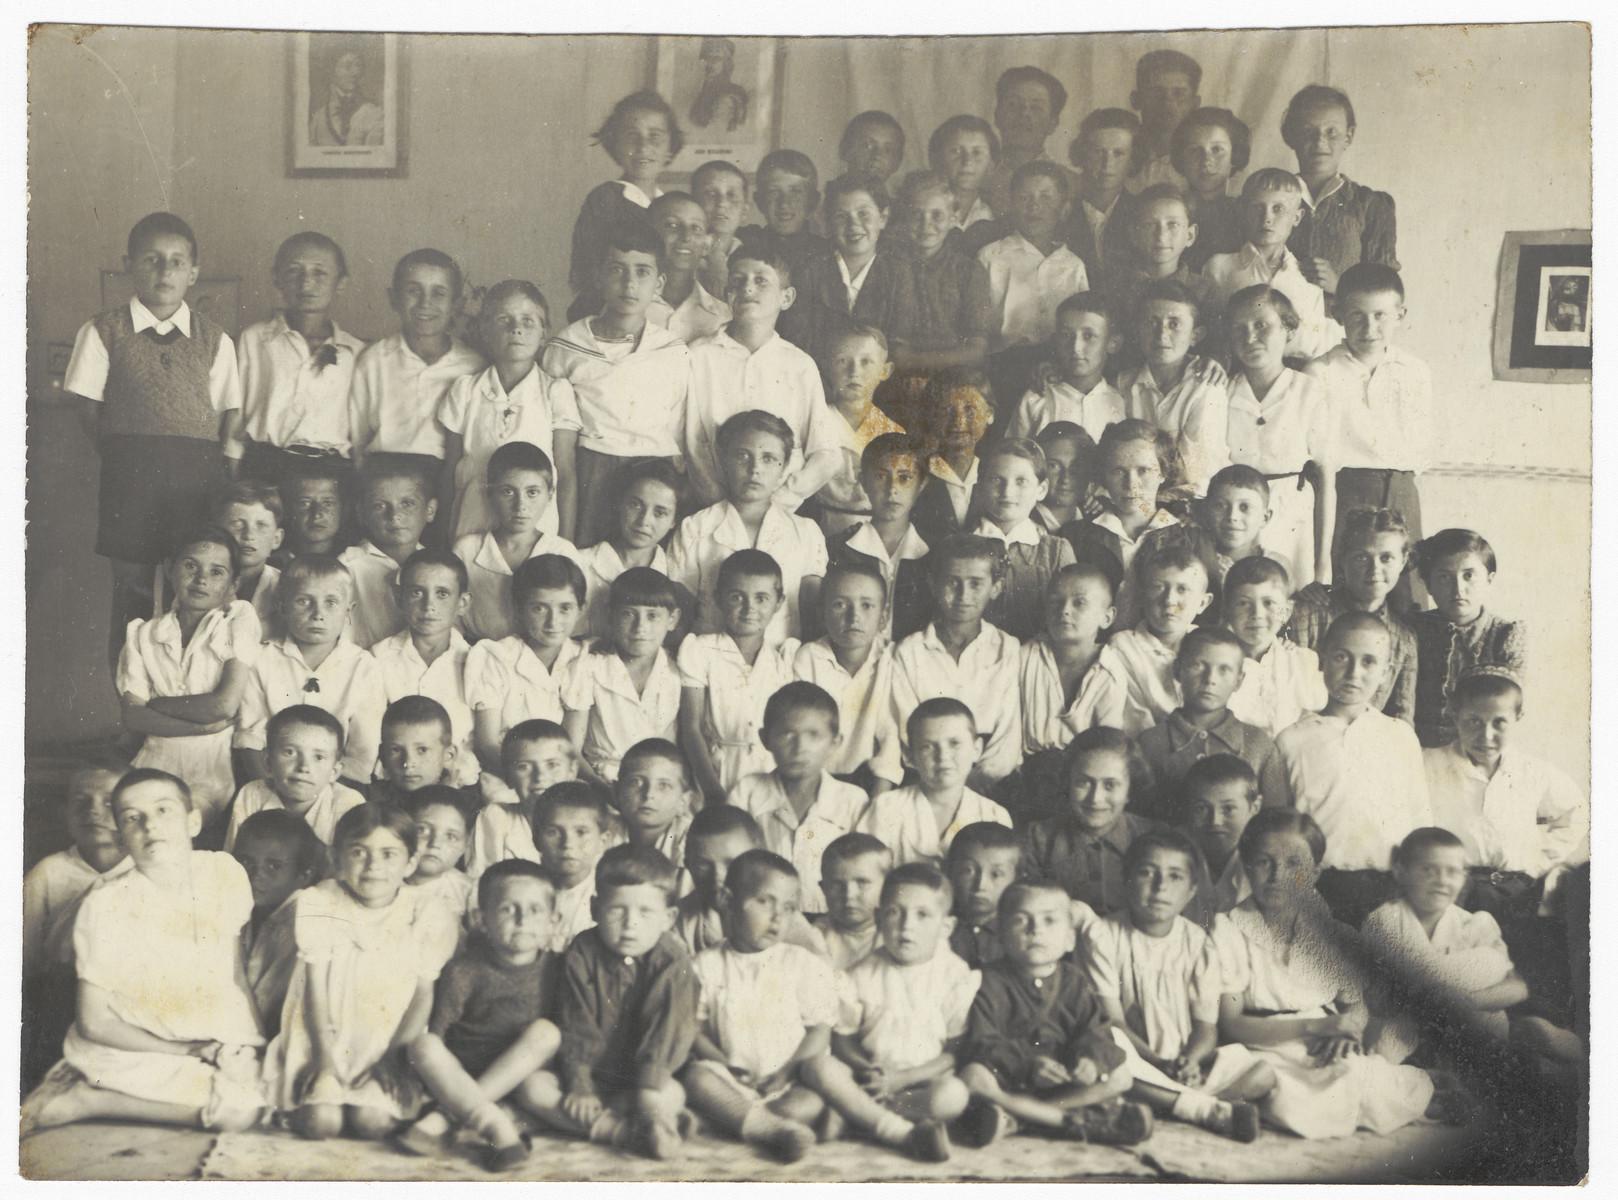 Group portrait of children, many of whom are Polish Jewish refugees, in a classroom in Andyzan, Uzbekistan.  Among those pictured are Alexander Shlachet, Janina Schlachet, Ludwik Flaszen, Irka Tzeder and Hania Grodzenka.